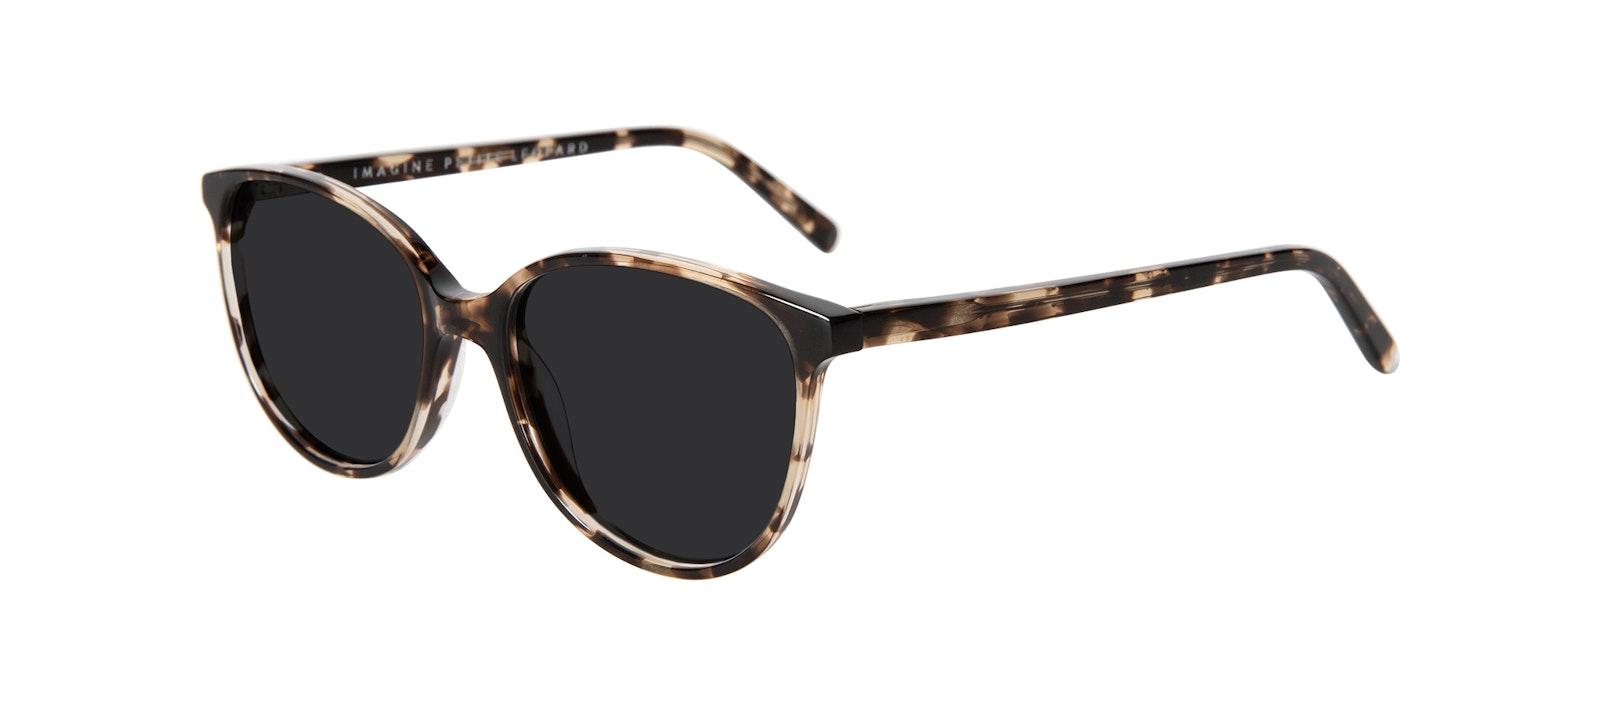 Affordable Fashion Glasses Round Sunglasses Women Imagine Petite Leopard Tilt